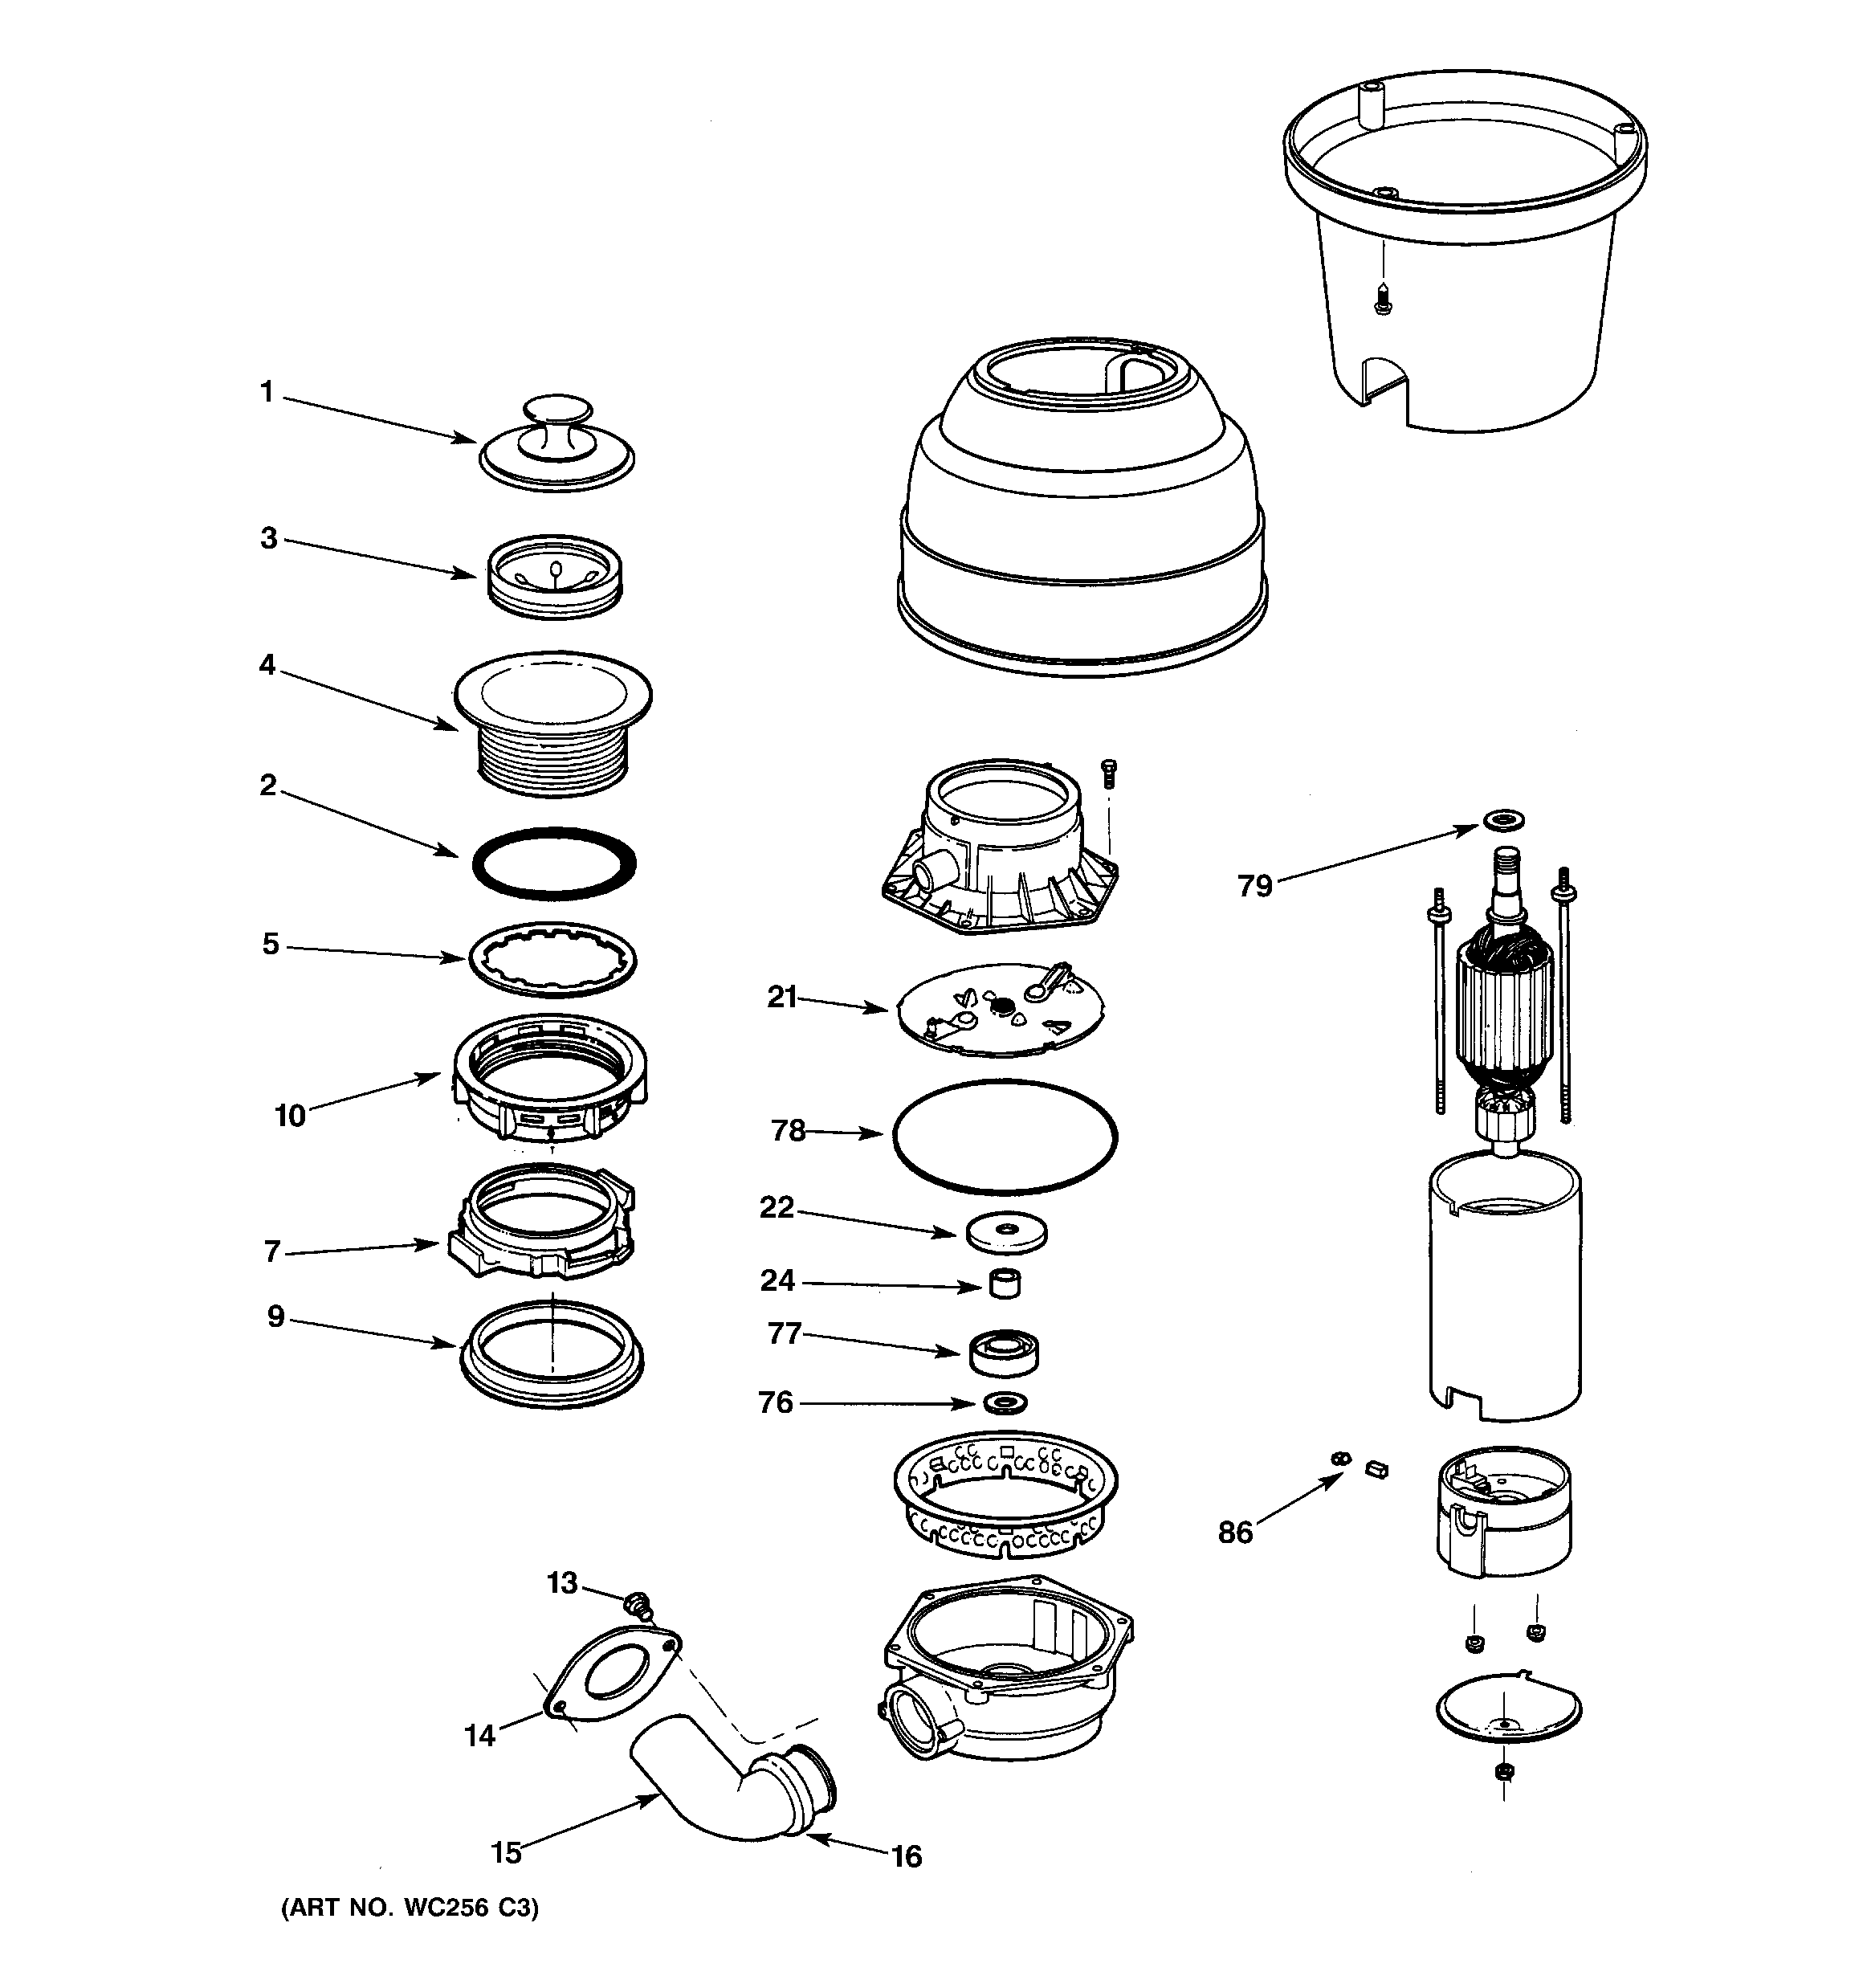 GB_8956] Ge Garbage Disposal Parts Diagram Free Download Wiring Diagram  Download Diagram   Ge Garbage Disposal Wiring Diagram      Www Mohammedshrine Librar Wiring 101